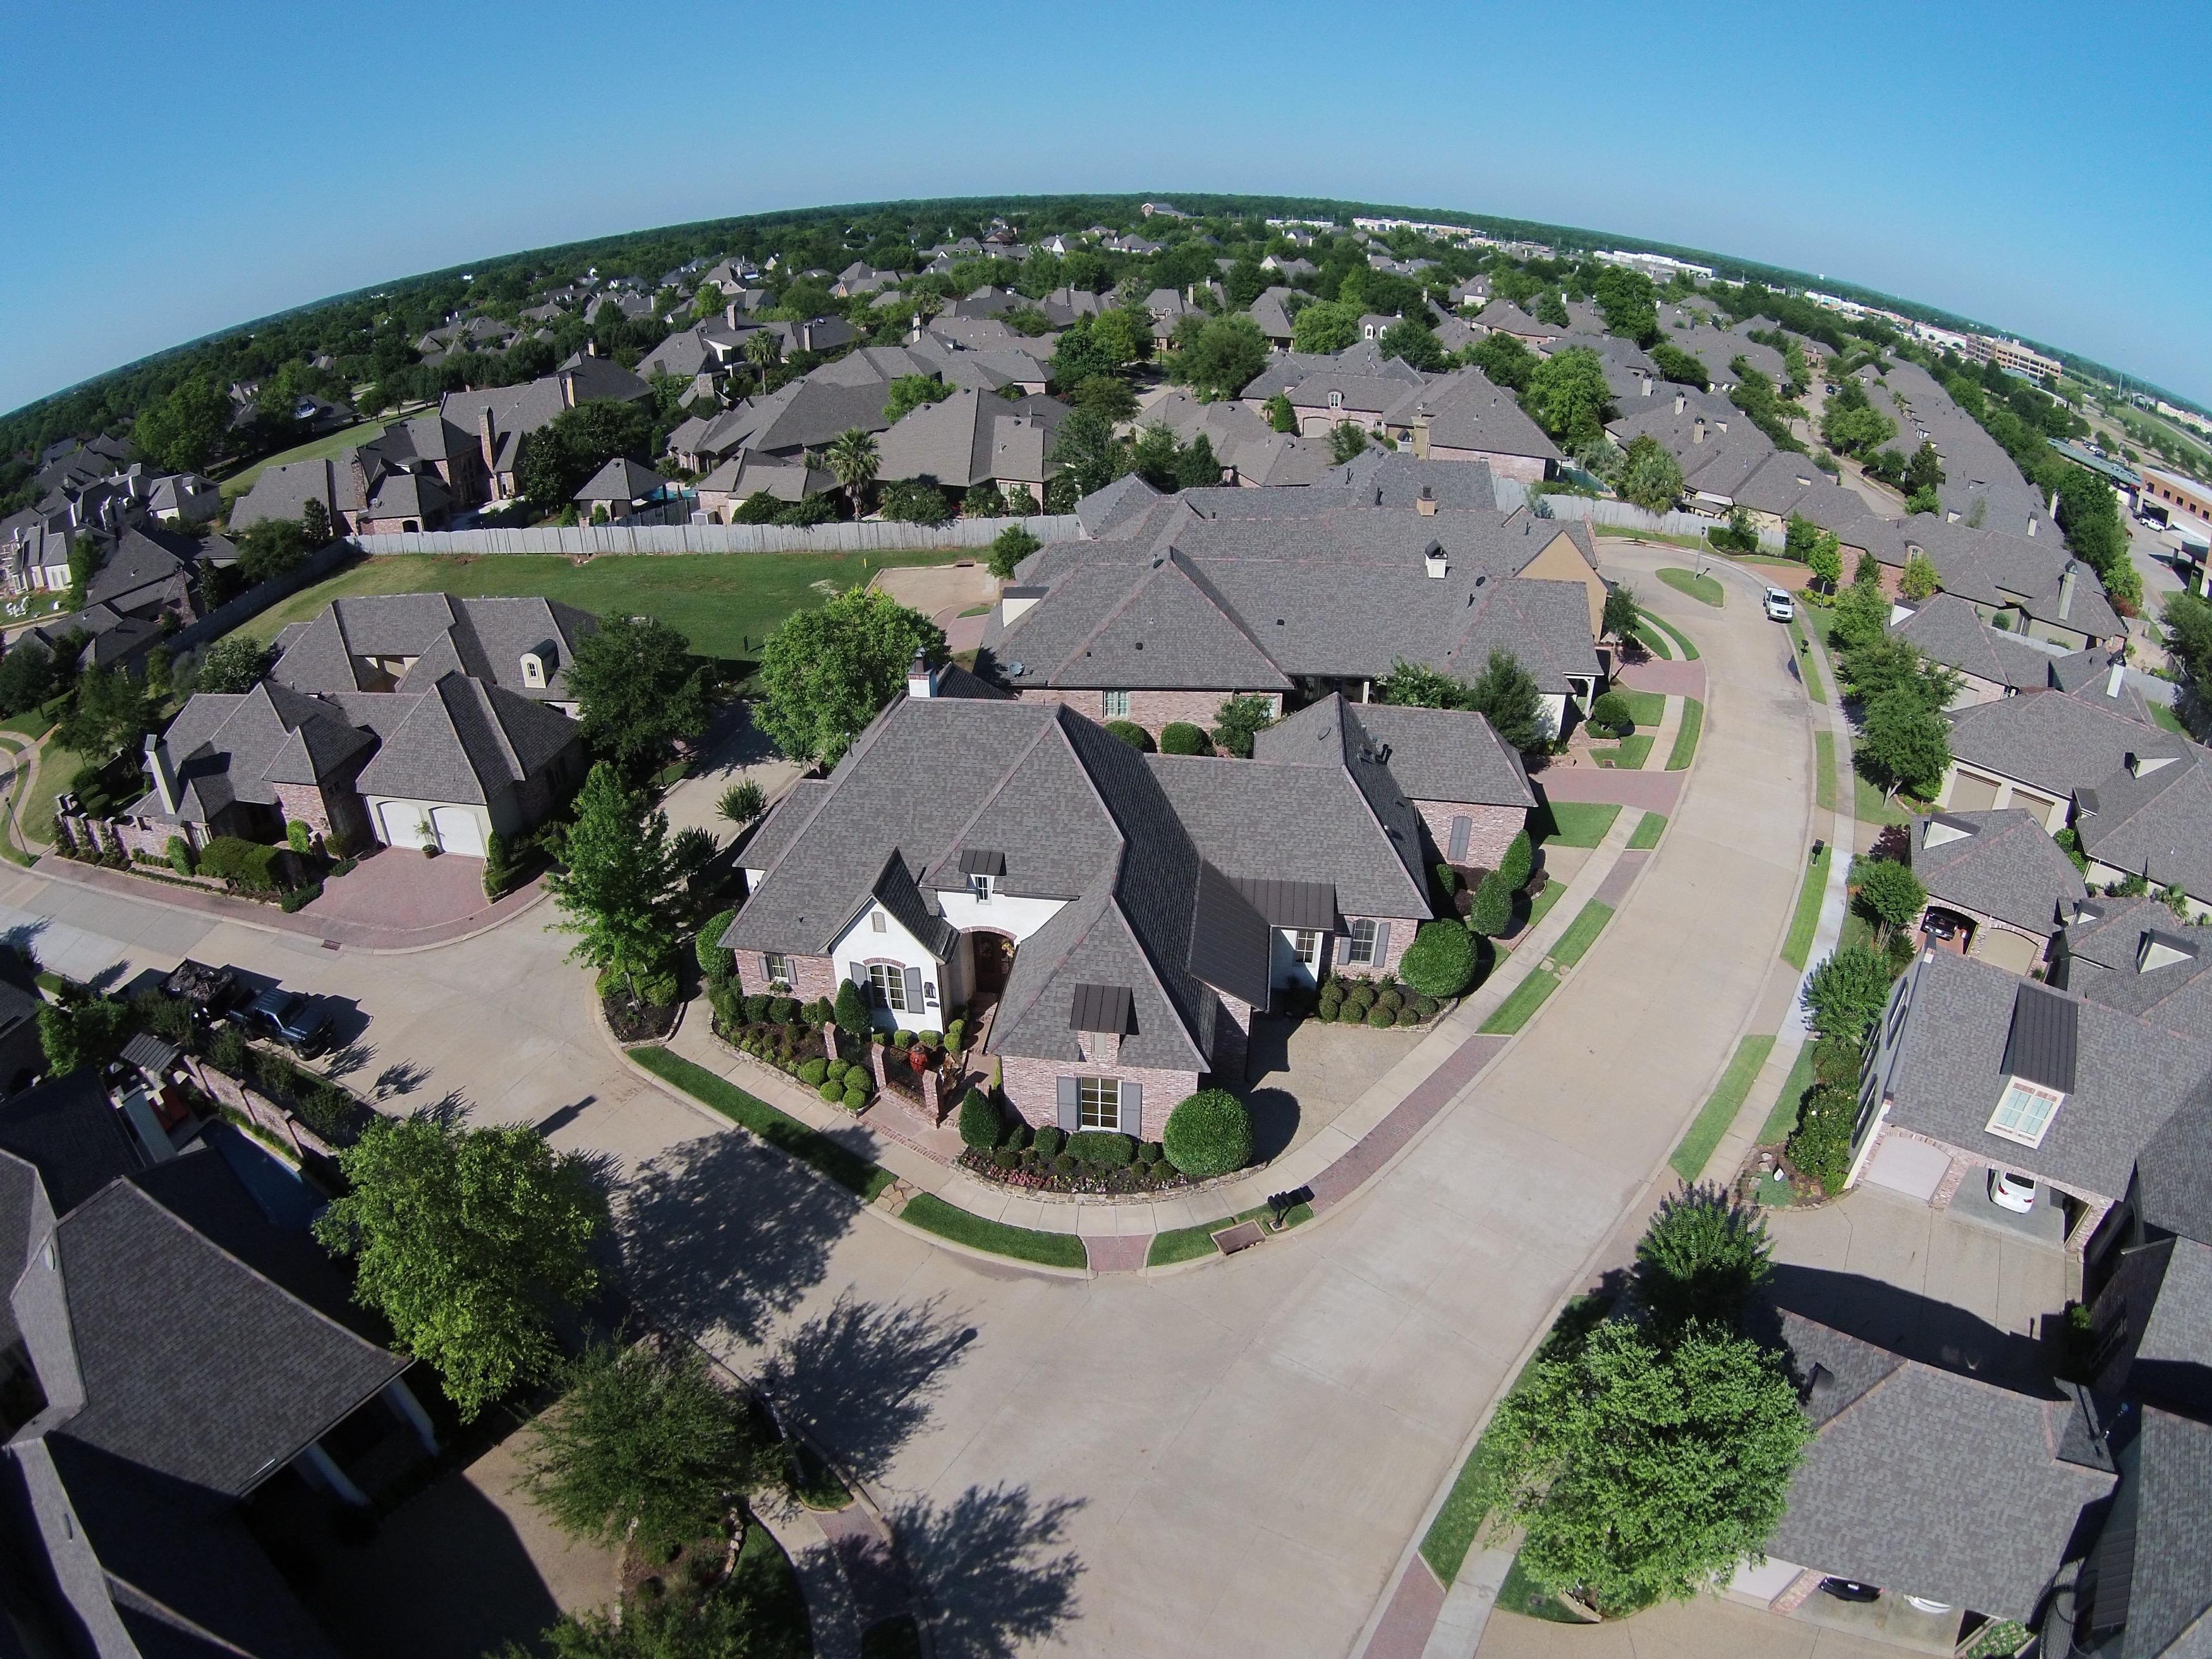 07 Oak Alley Vieux Carre Drone Overheadresize